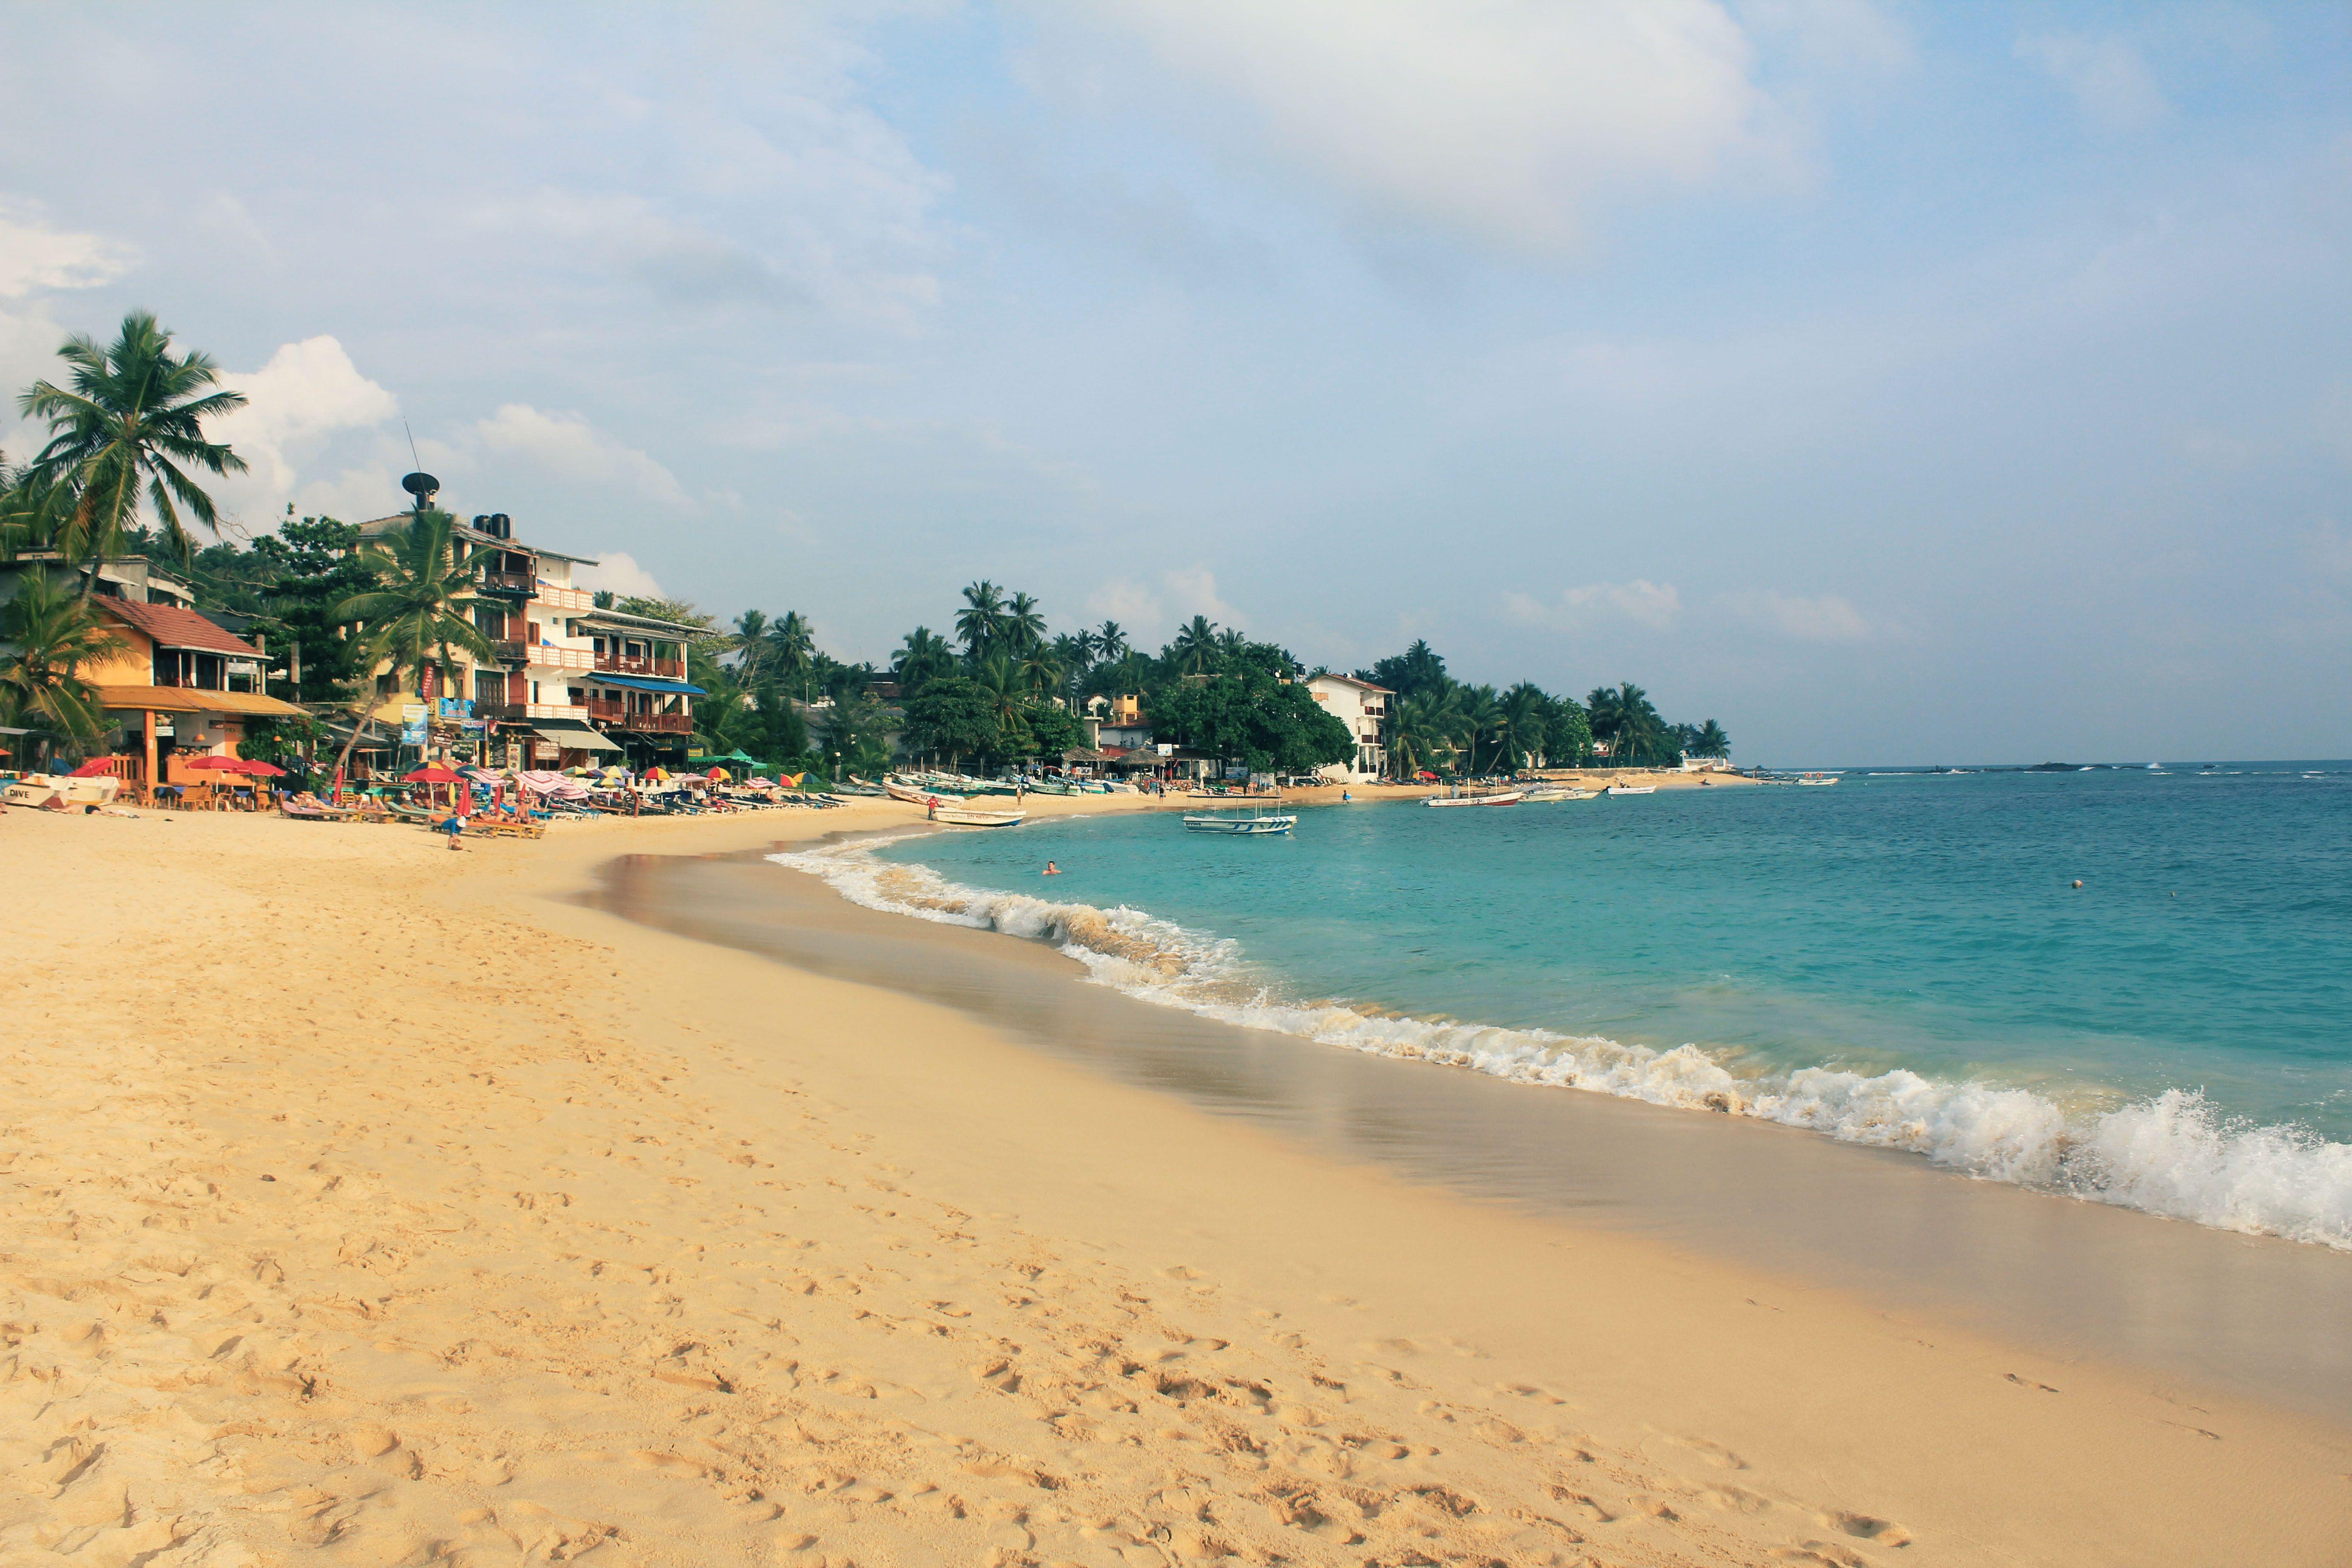 Мальдивский пляж на шри ланке фото